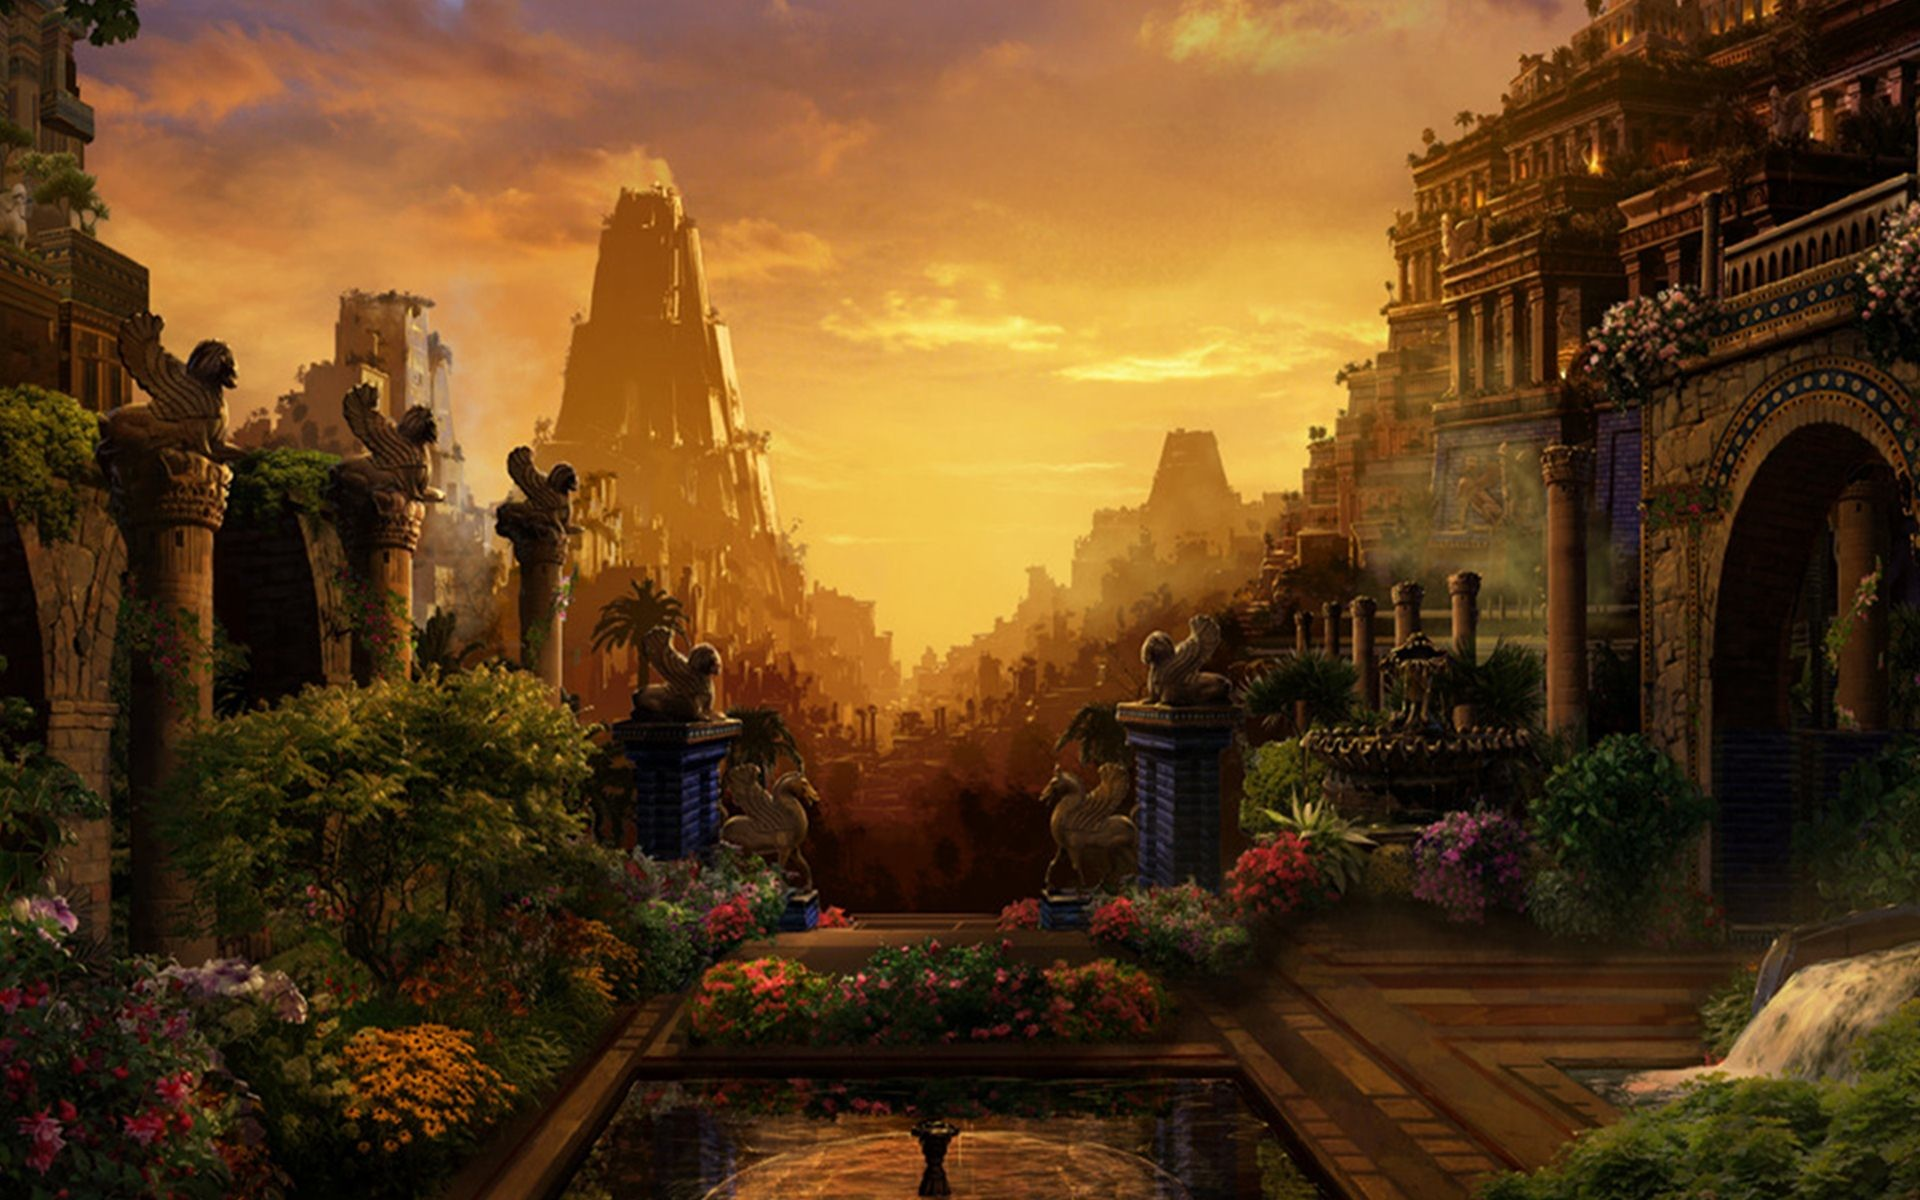 Hanging Gardens Of Babylon Wallpaper 47 Images